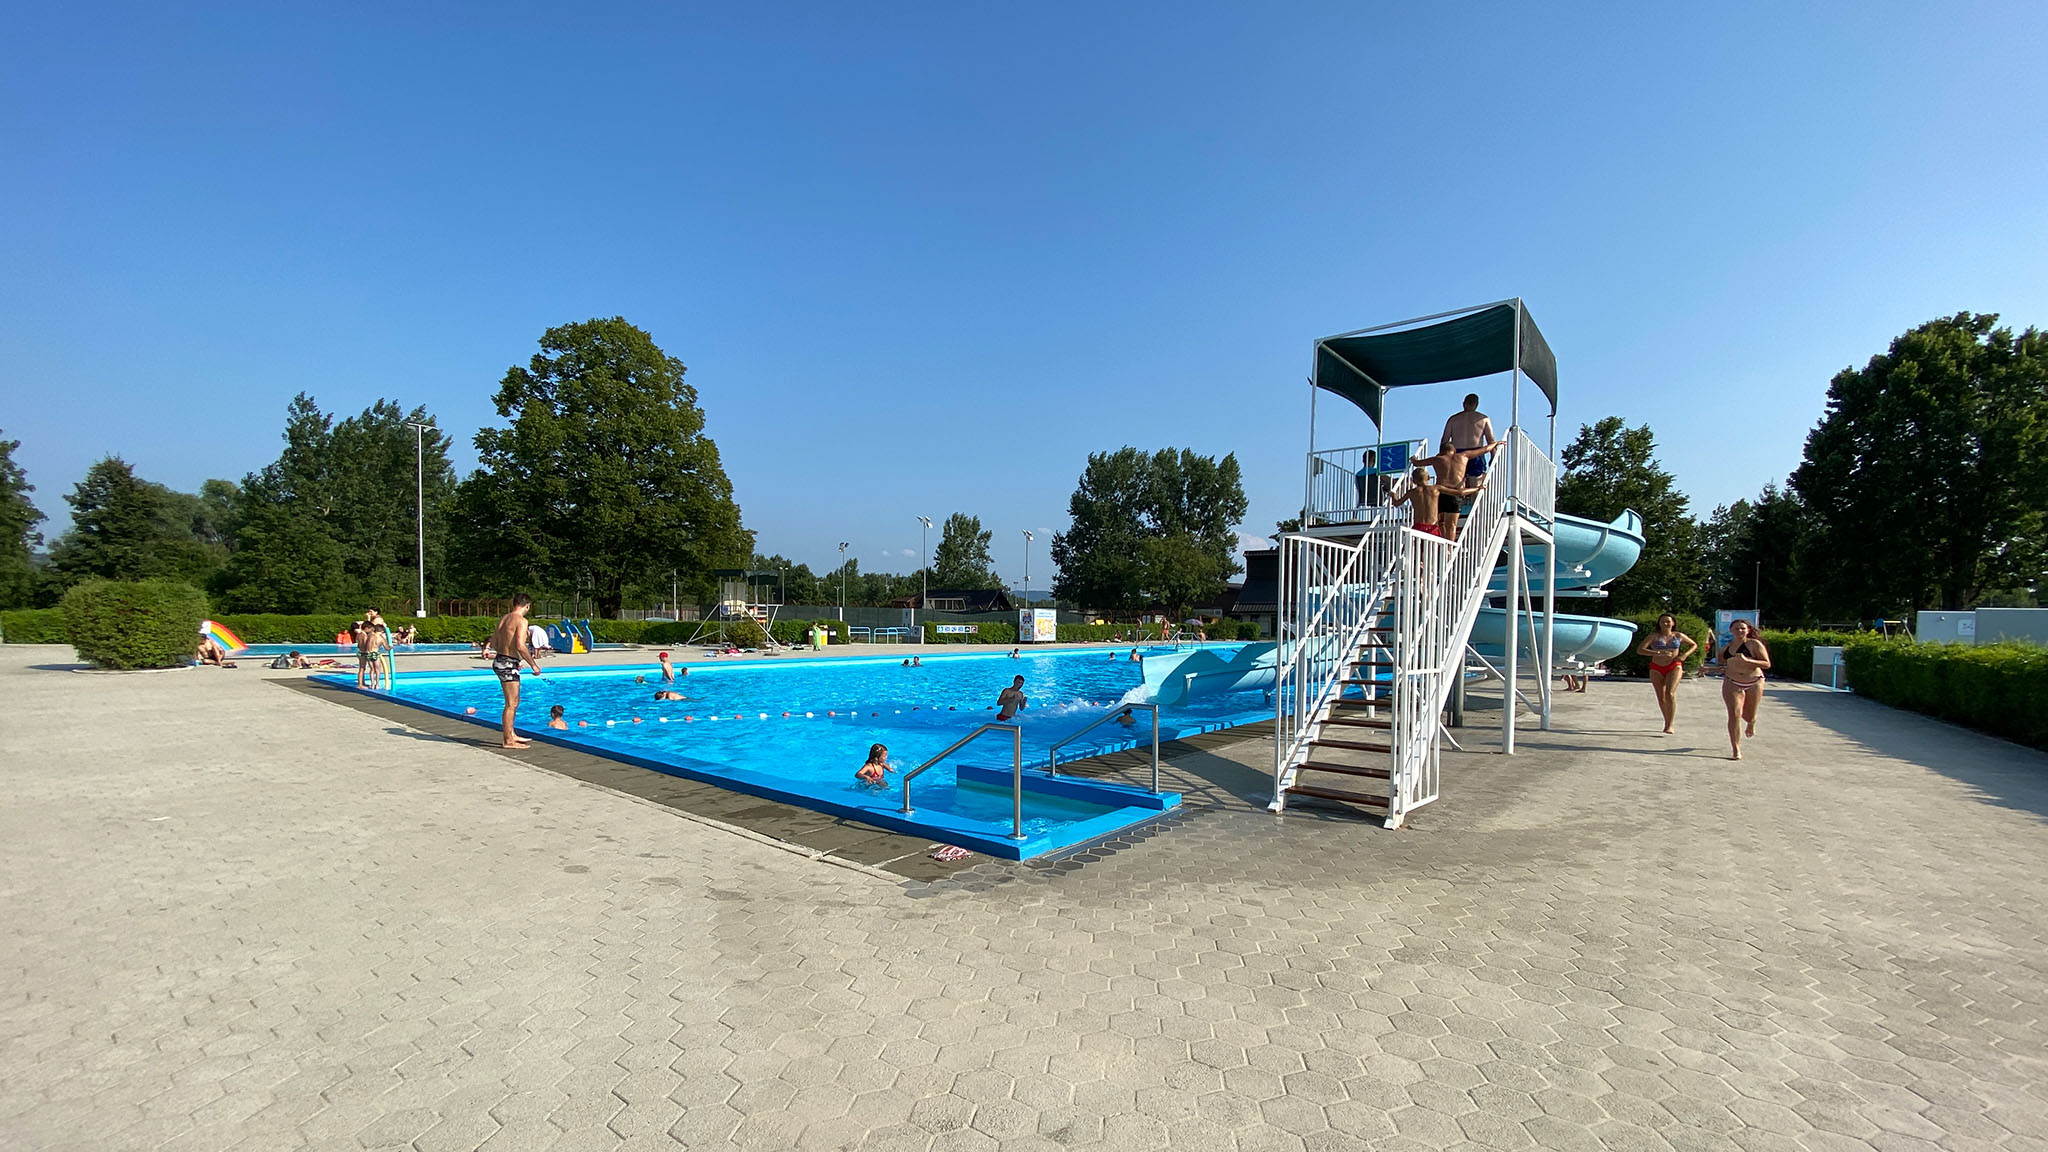 Domzale swimming pool, Slovenia.